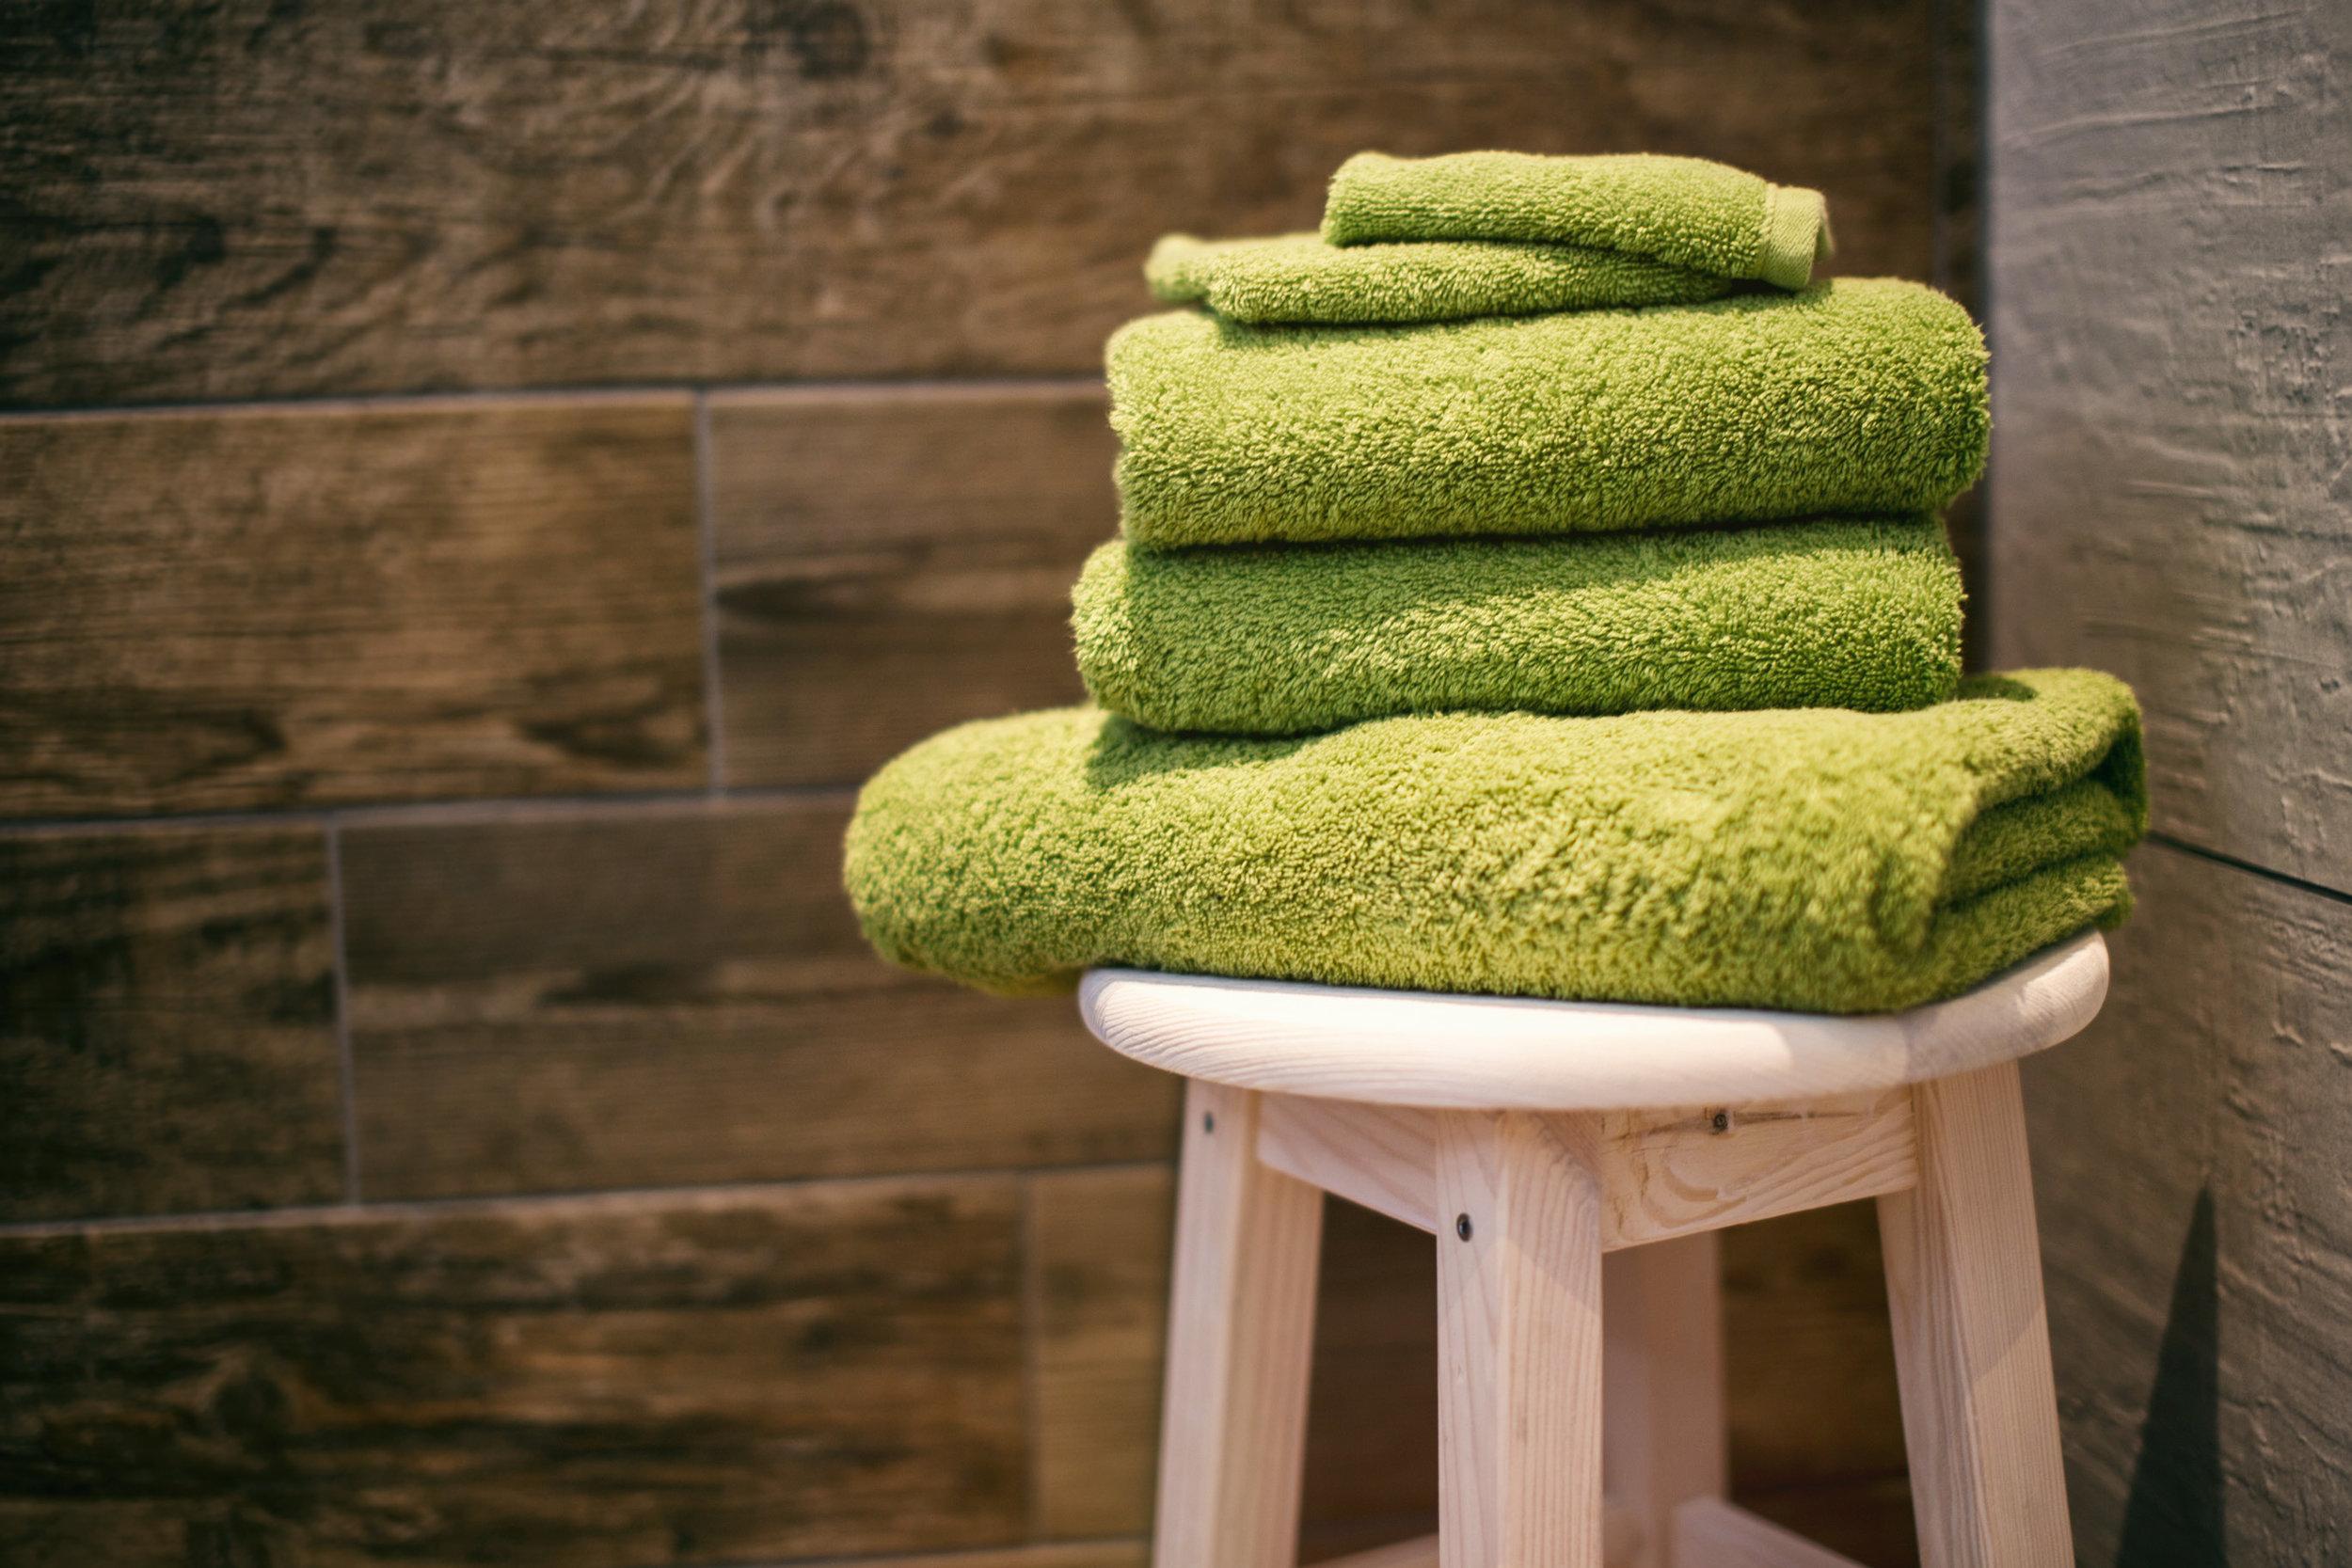 heated towels